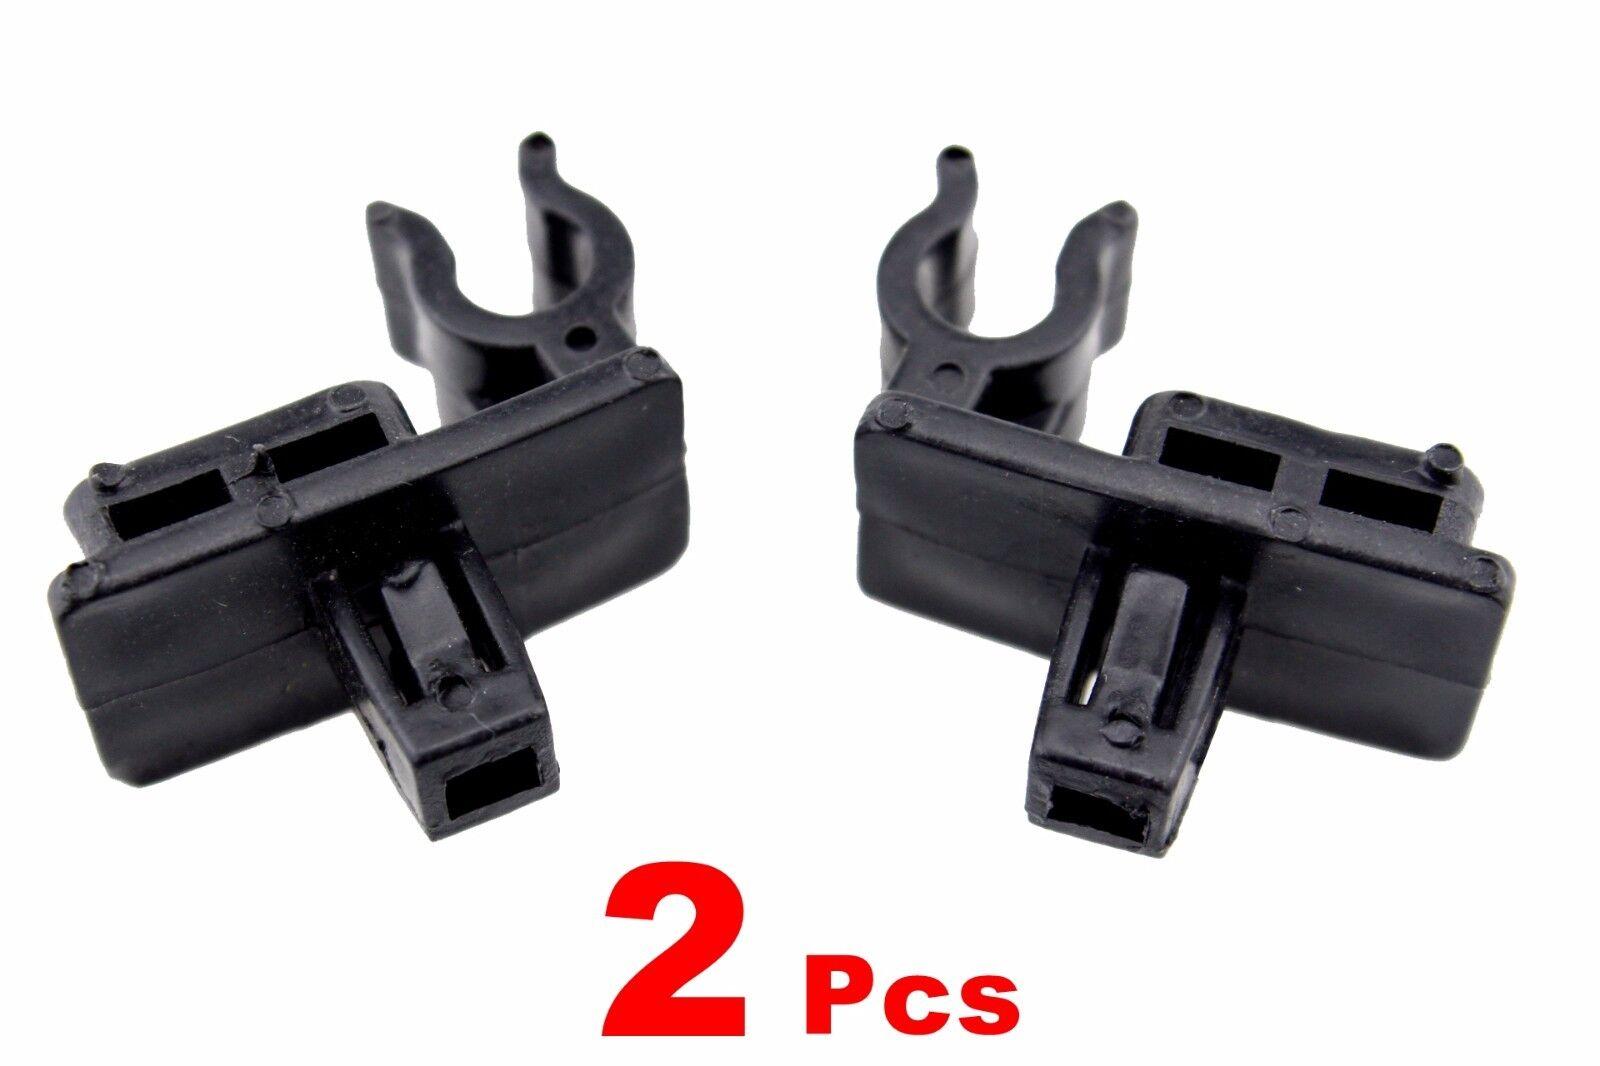 10pcs of Pare-chocs Clips pour Toyota Yaris 904670707122 Push-Type Retainer Clip